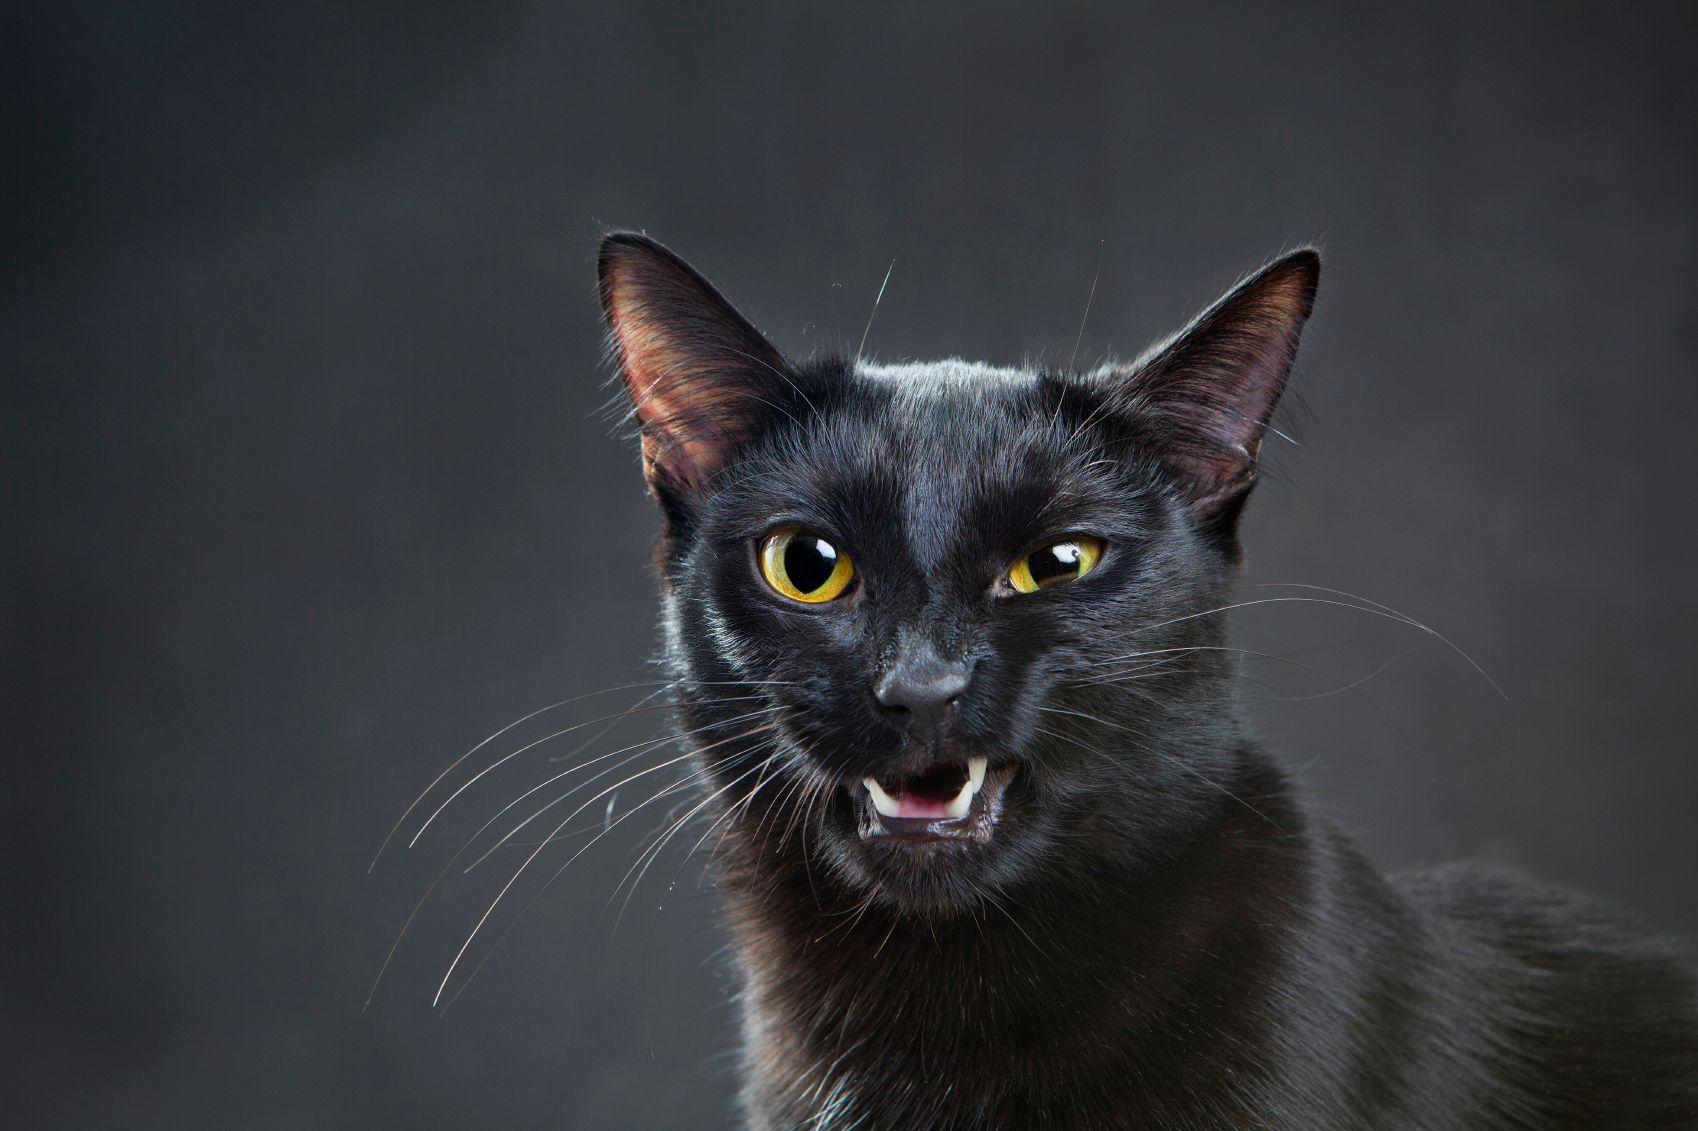 Twitter Reddit Tumblr. Une grosse bite noire dans un sexe interracial.